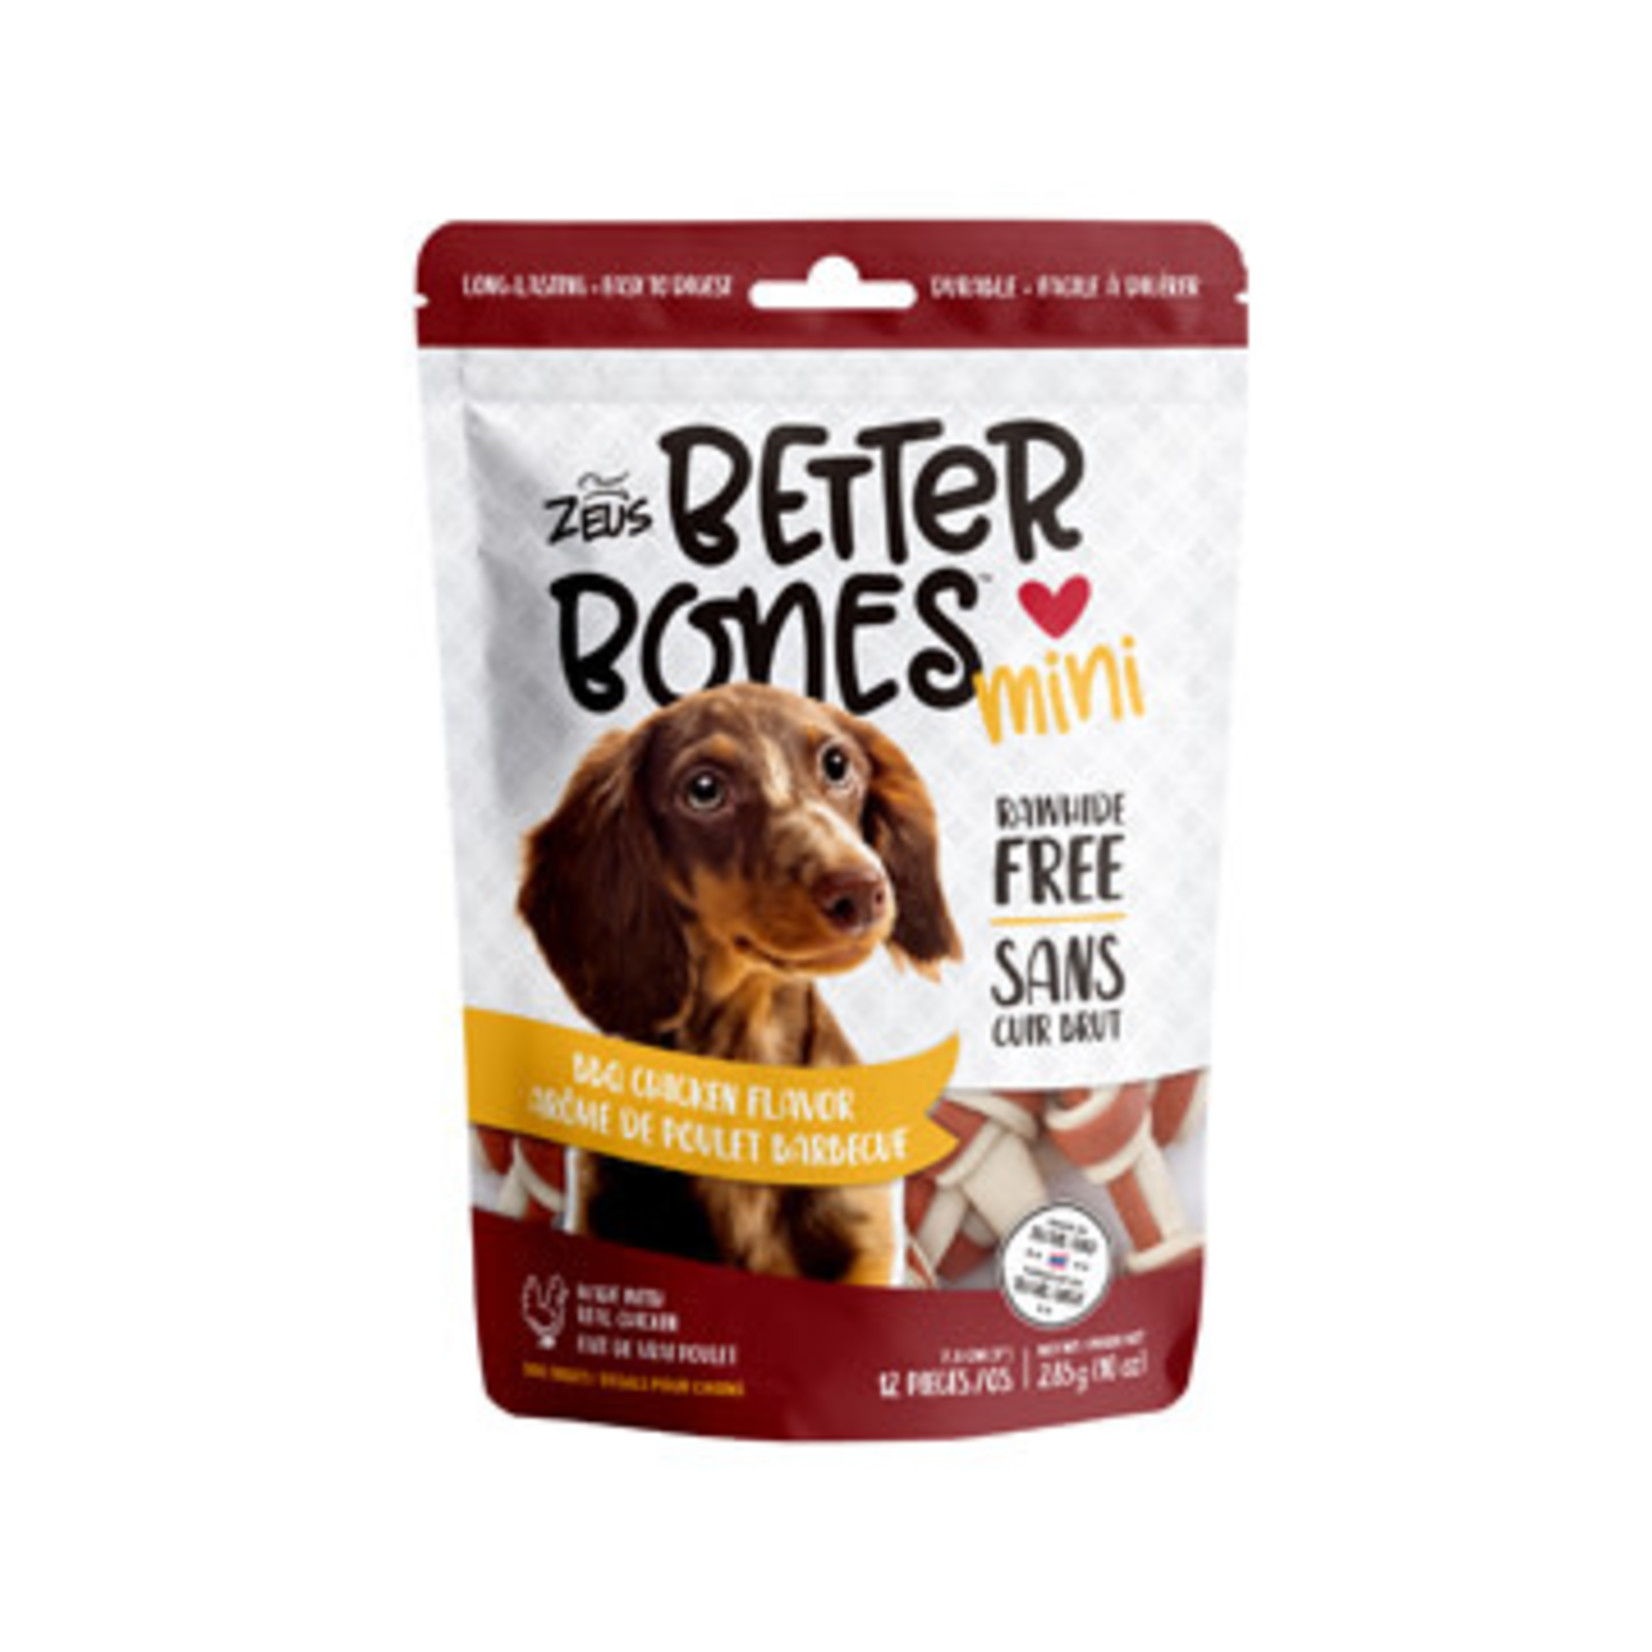 Better Bones BBQ Chicken 7.5cm 12pk